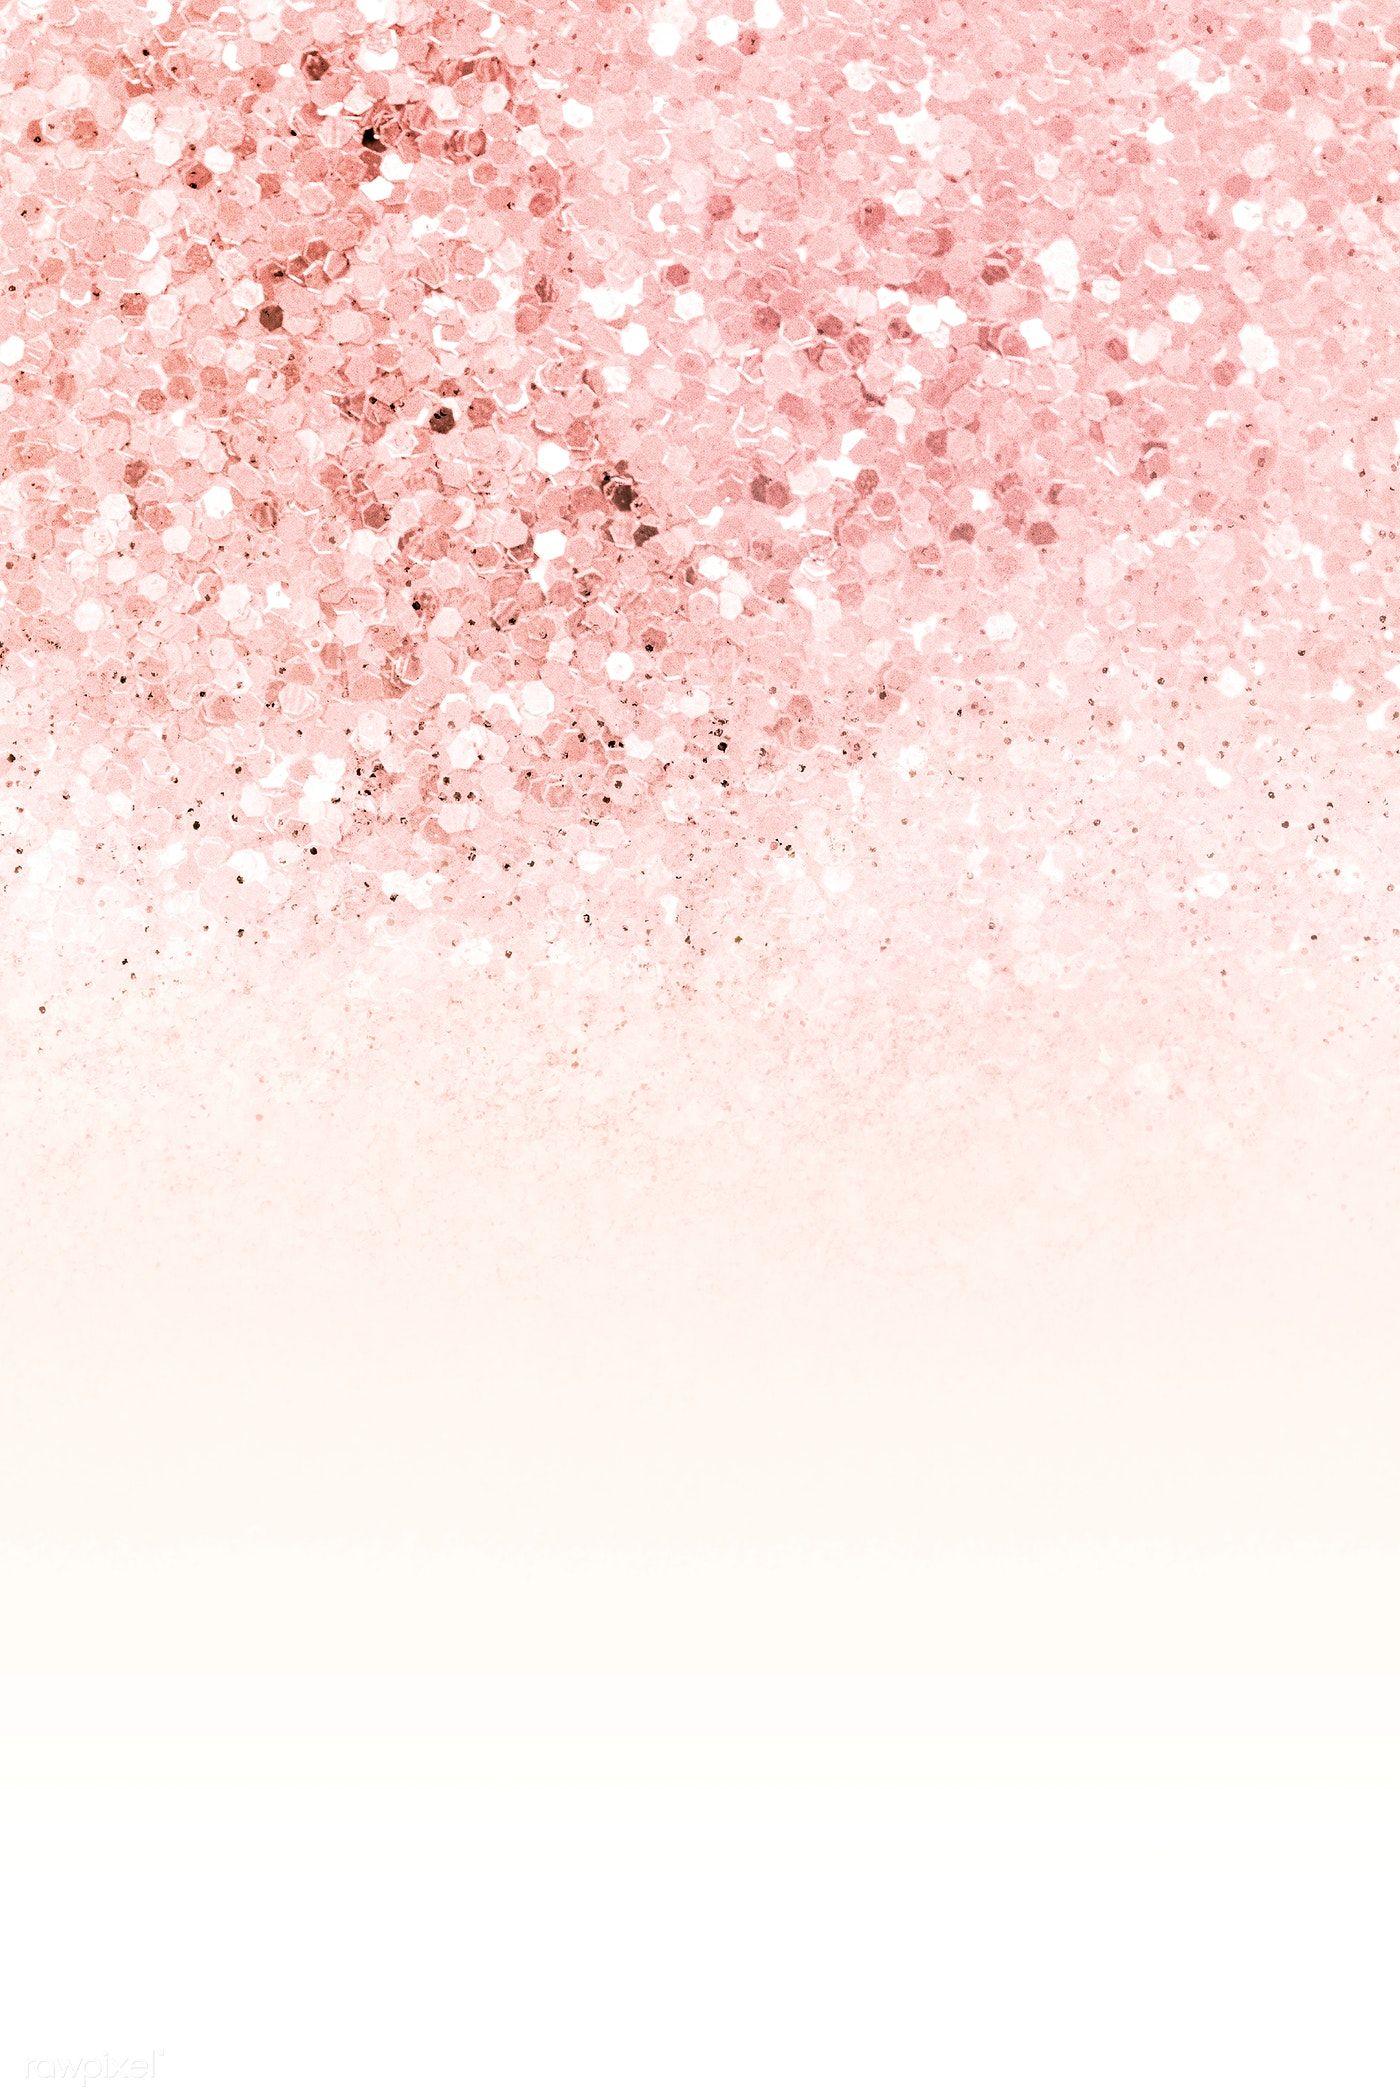 Download Premium Illustration Of Pink Ombre Glitter Textured Background Pink Glitter Wallpaper Pink Glitter Background Pink Sparkle Background